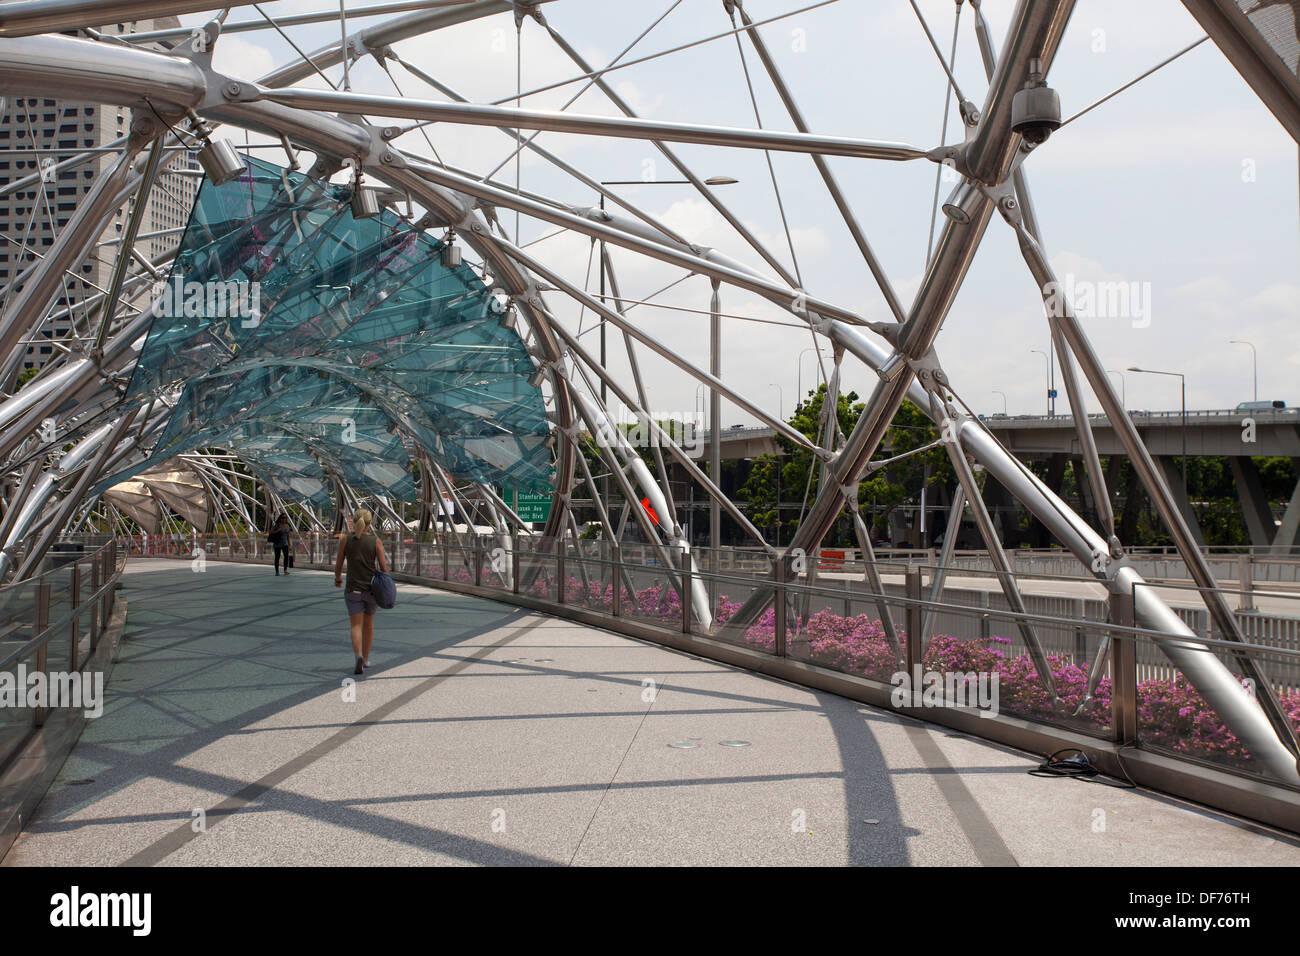 Covered Walkway Construction : Walkway marina bay sands hotel area singapore asia walking